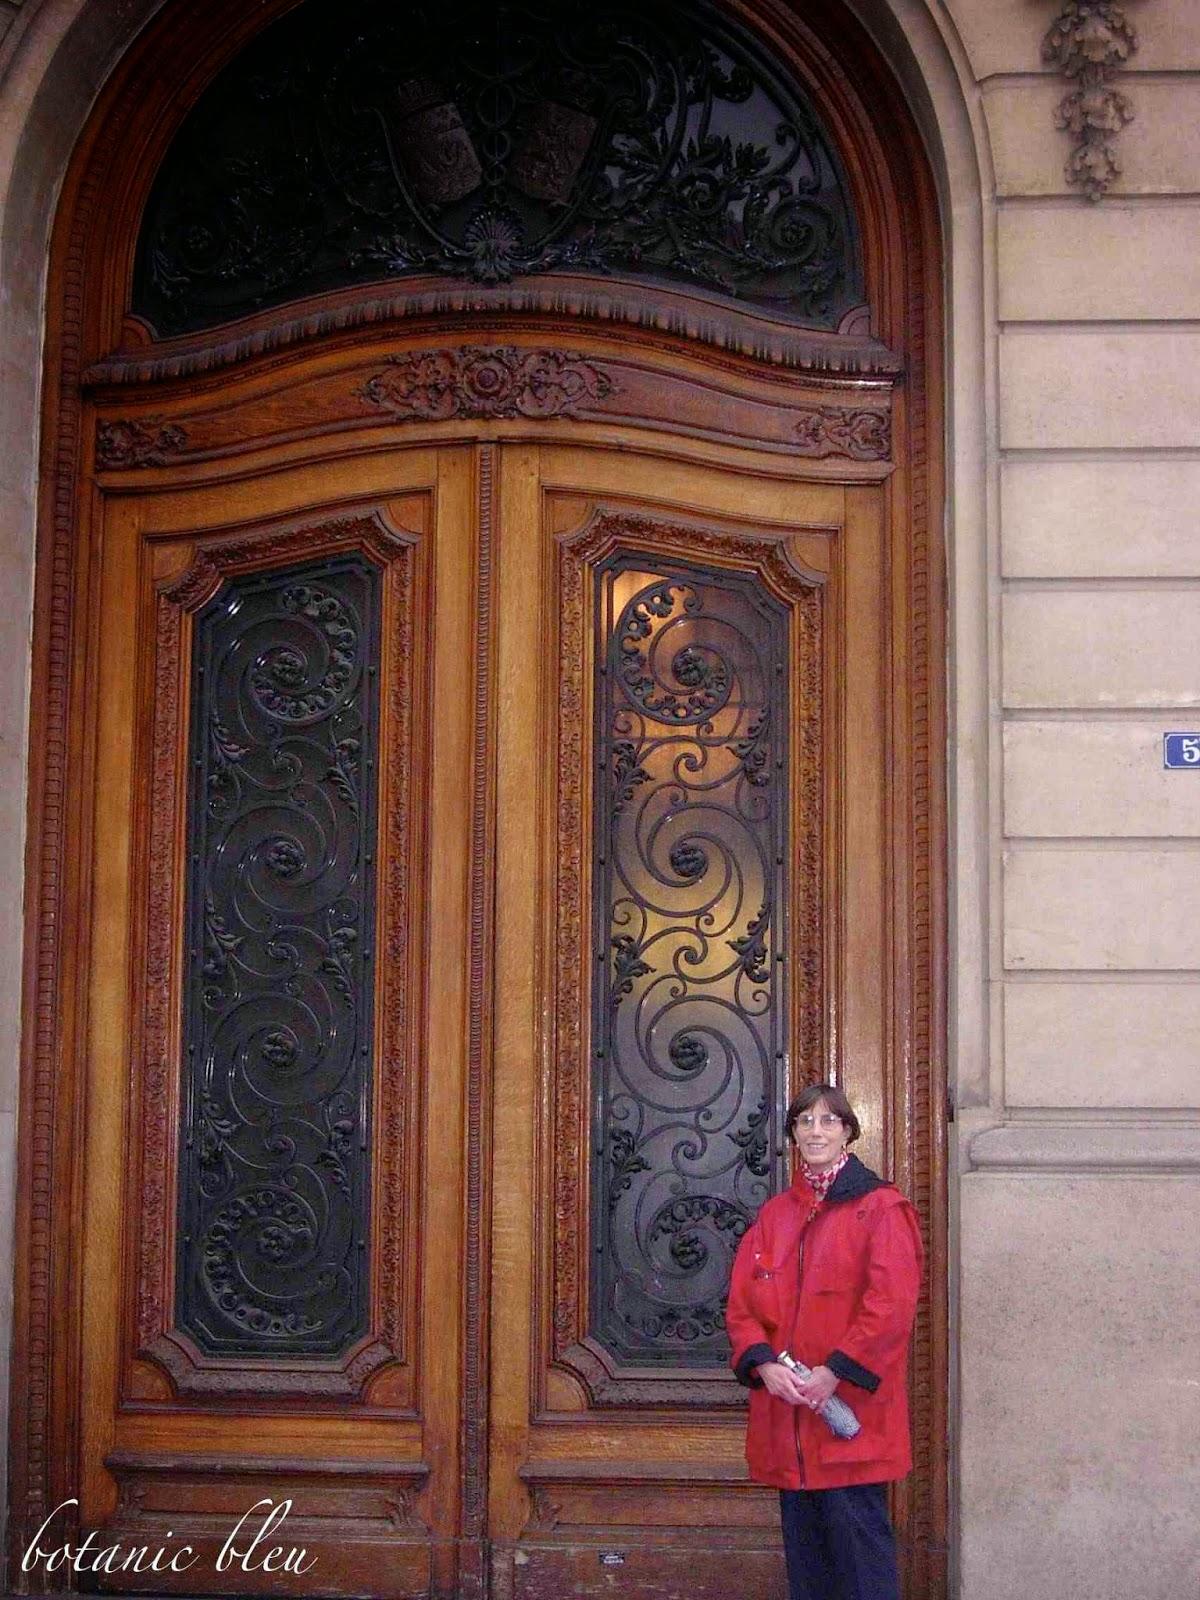 Botanic bleu amour de porte fran aise for Porte francaise